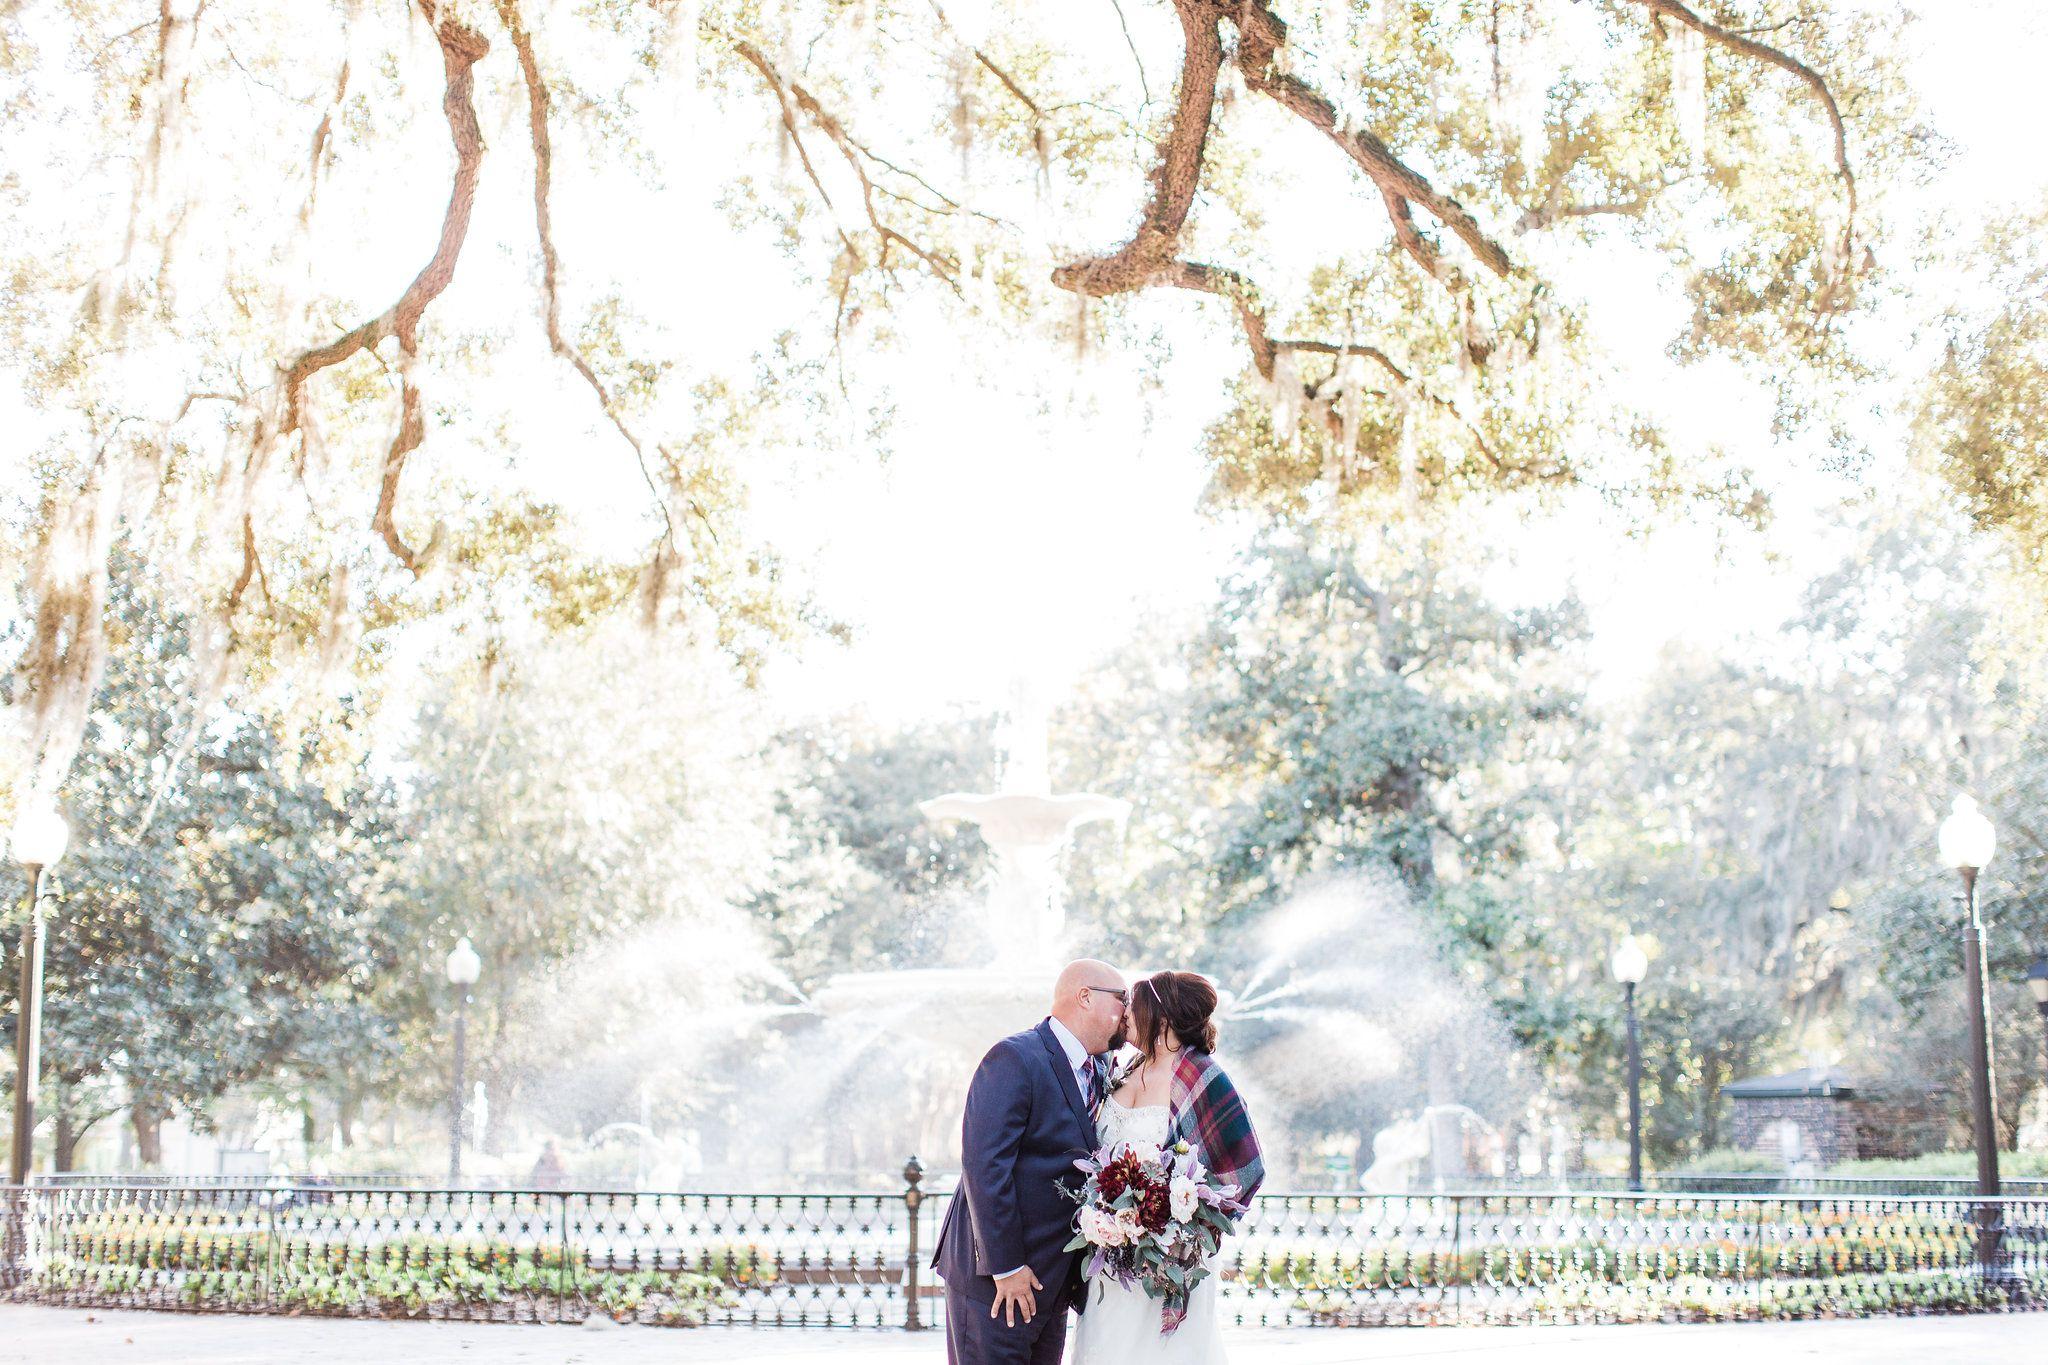 Kristy + Rob Savannah wedding photographer, Savannah